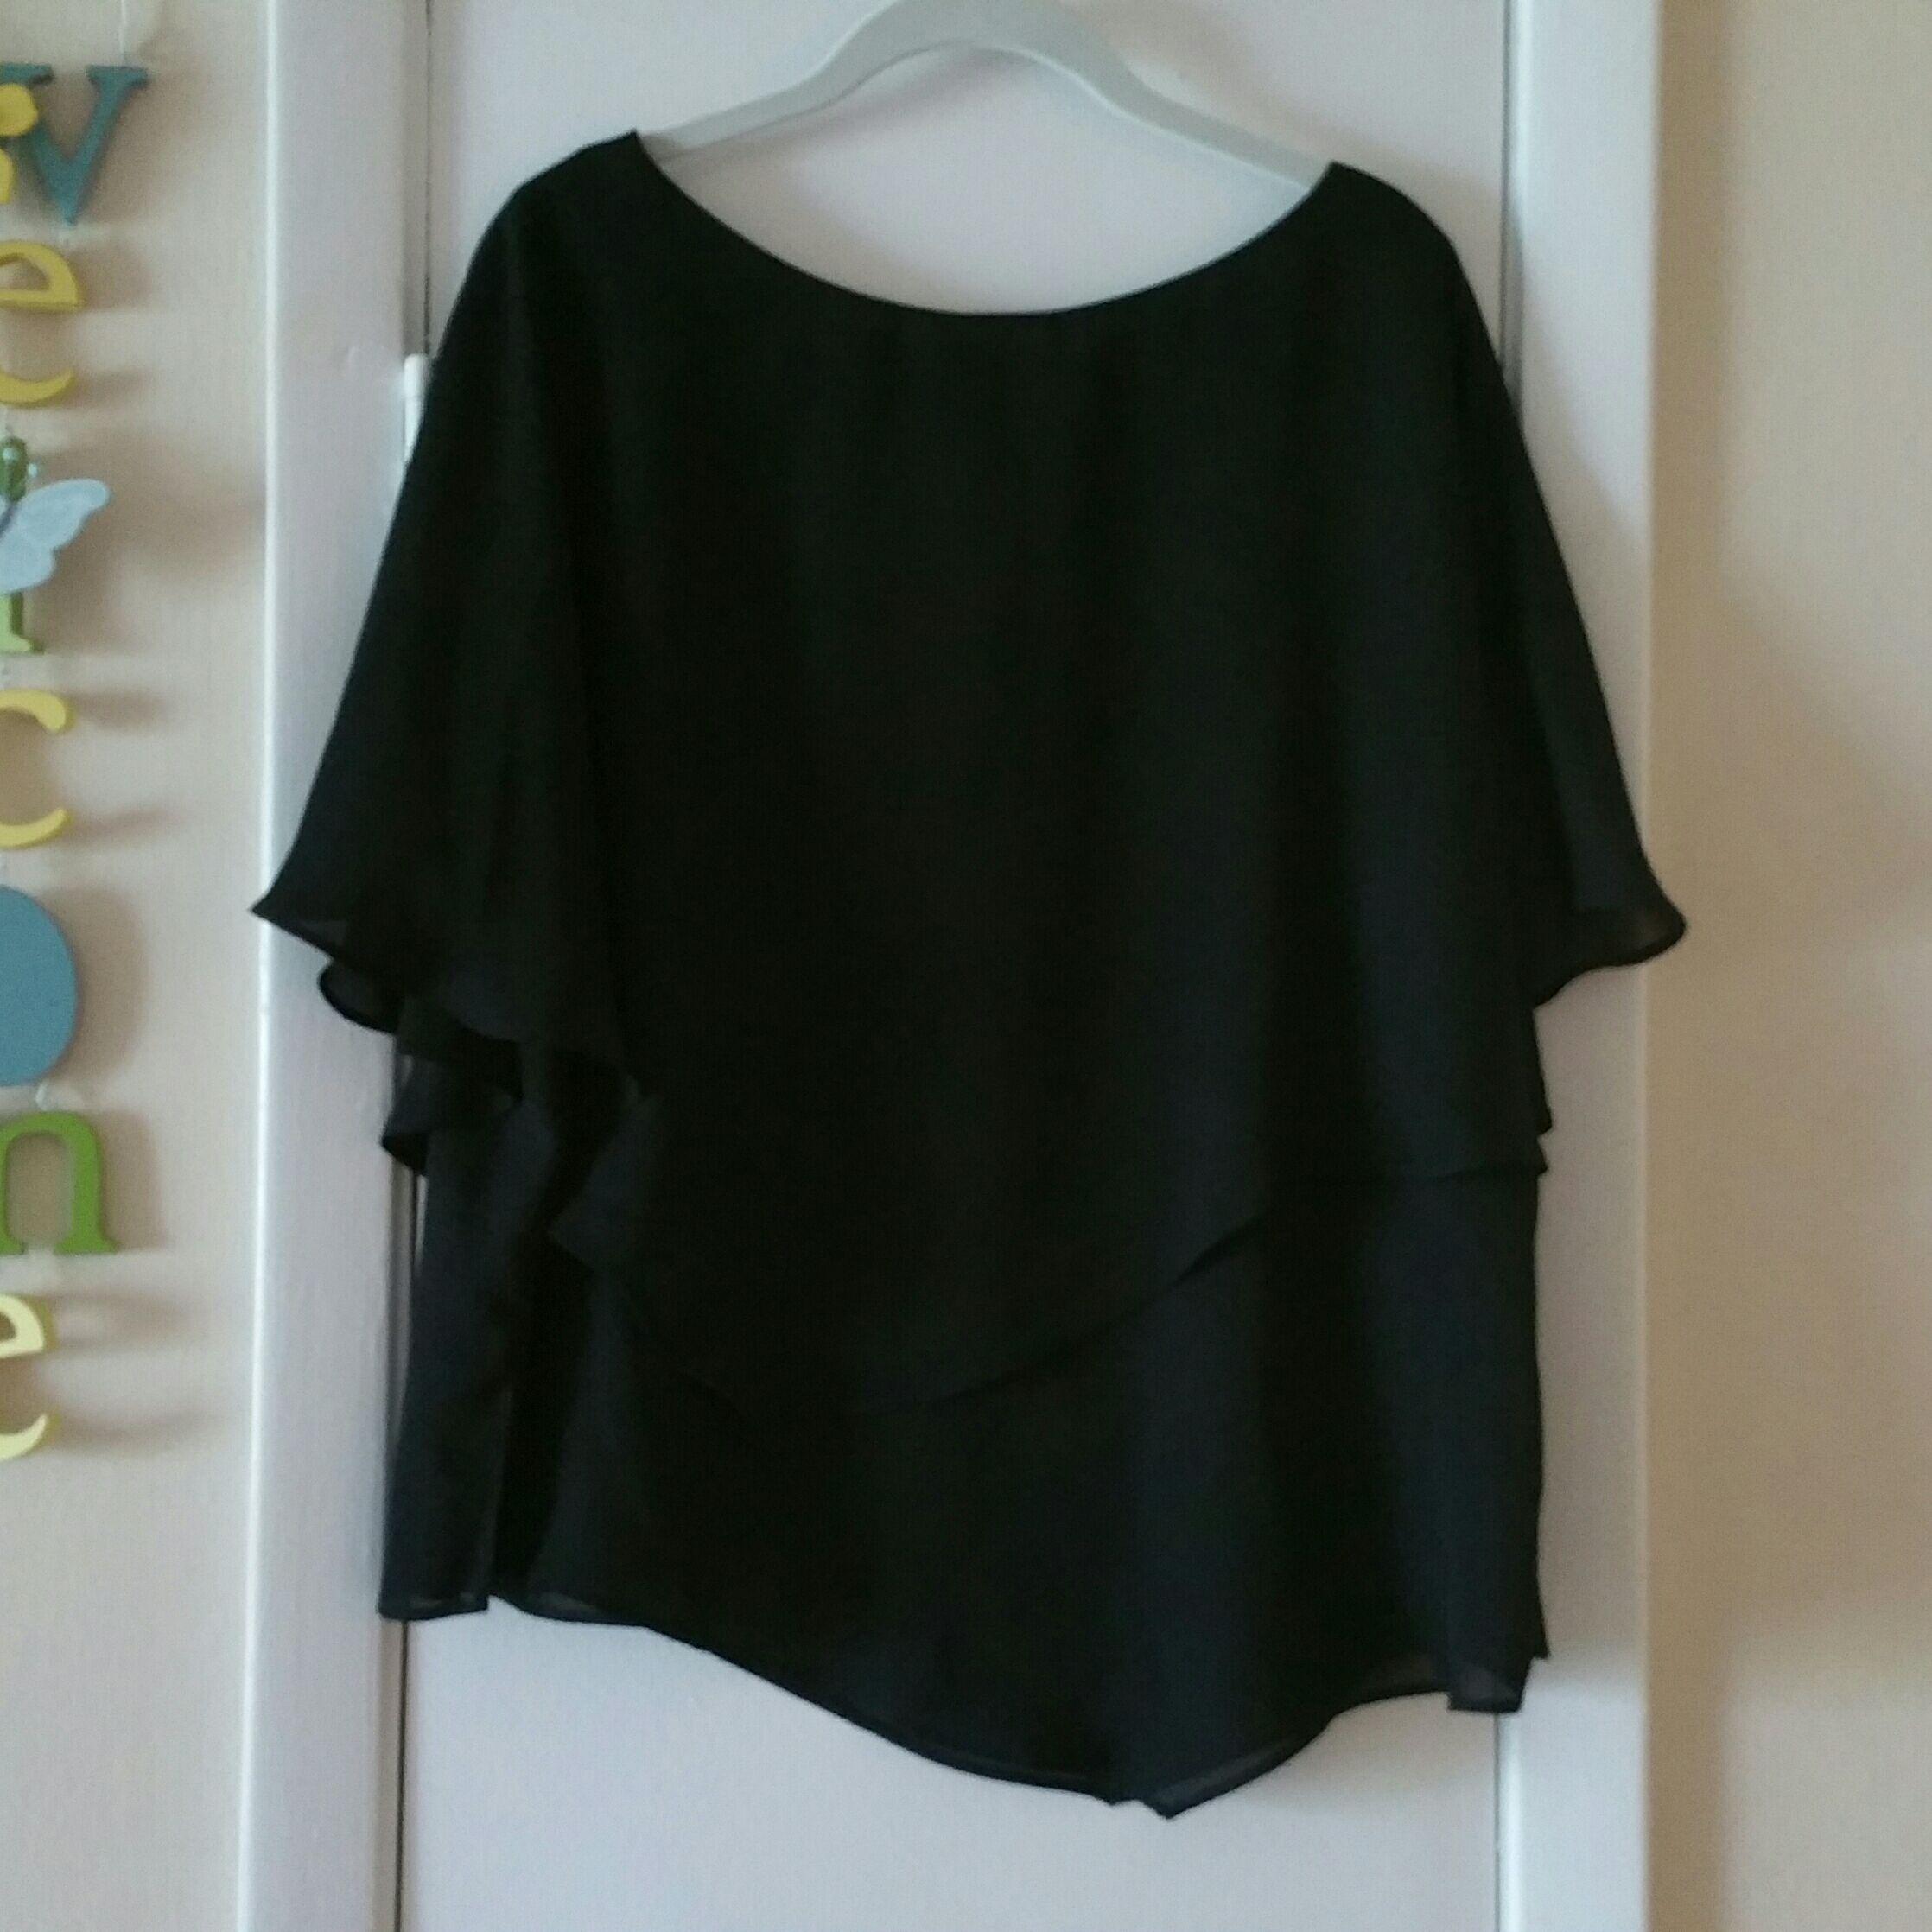 Dressy women's blouse, black,18W